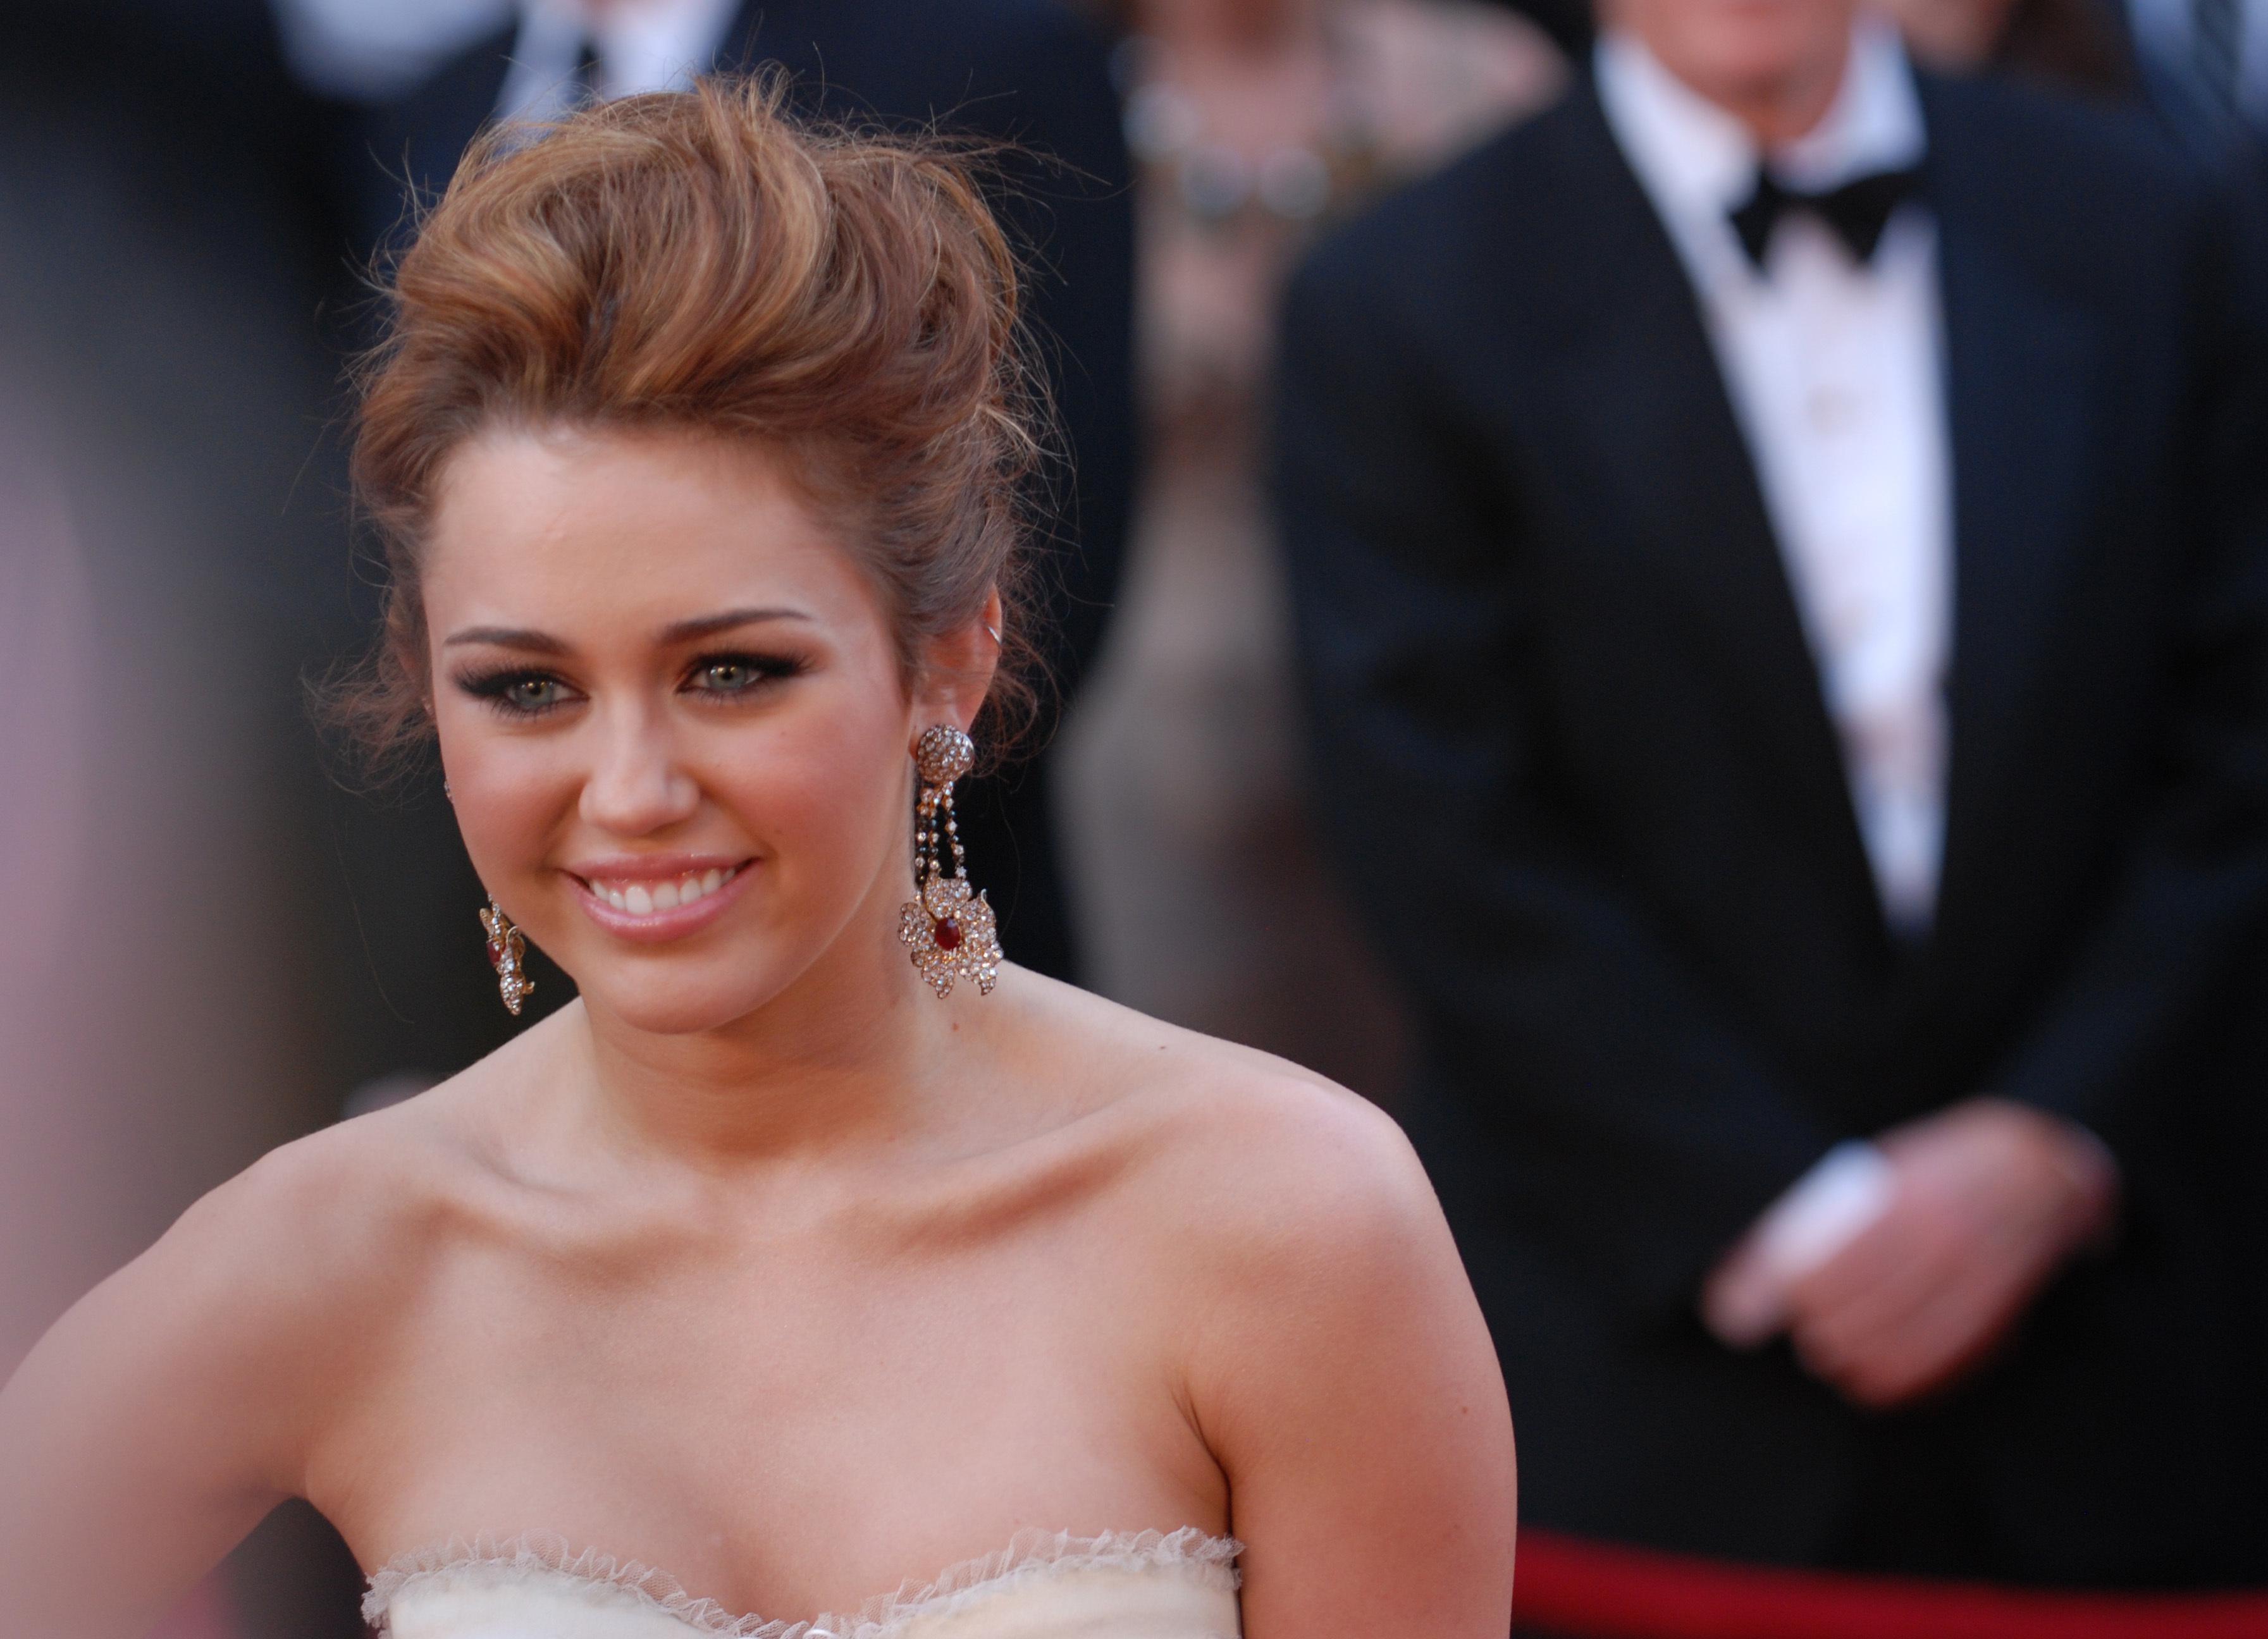 Miley Cyrus Face 2020 Wallpaper, HD Celebrities 4K